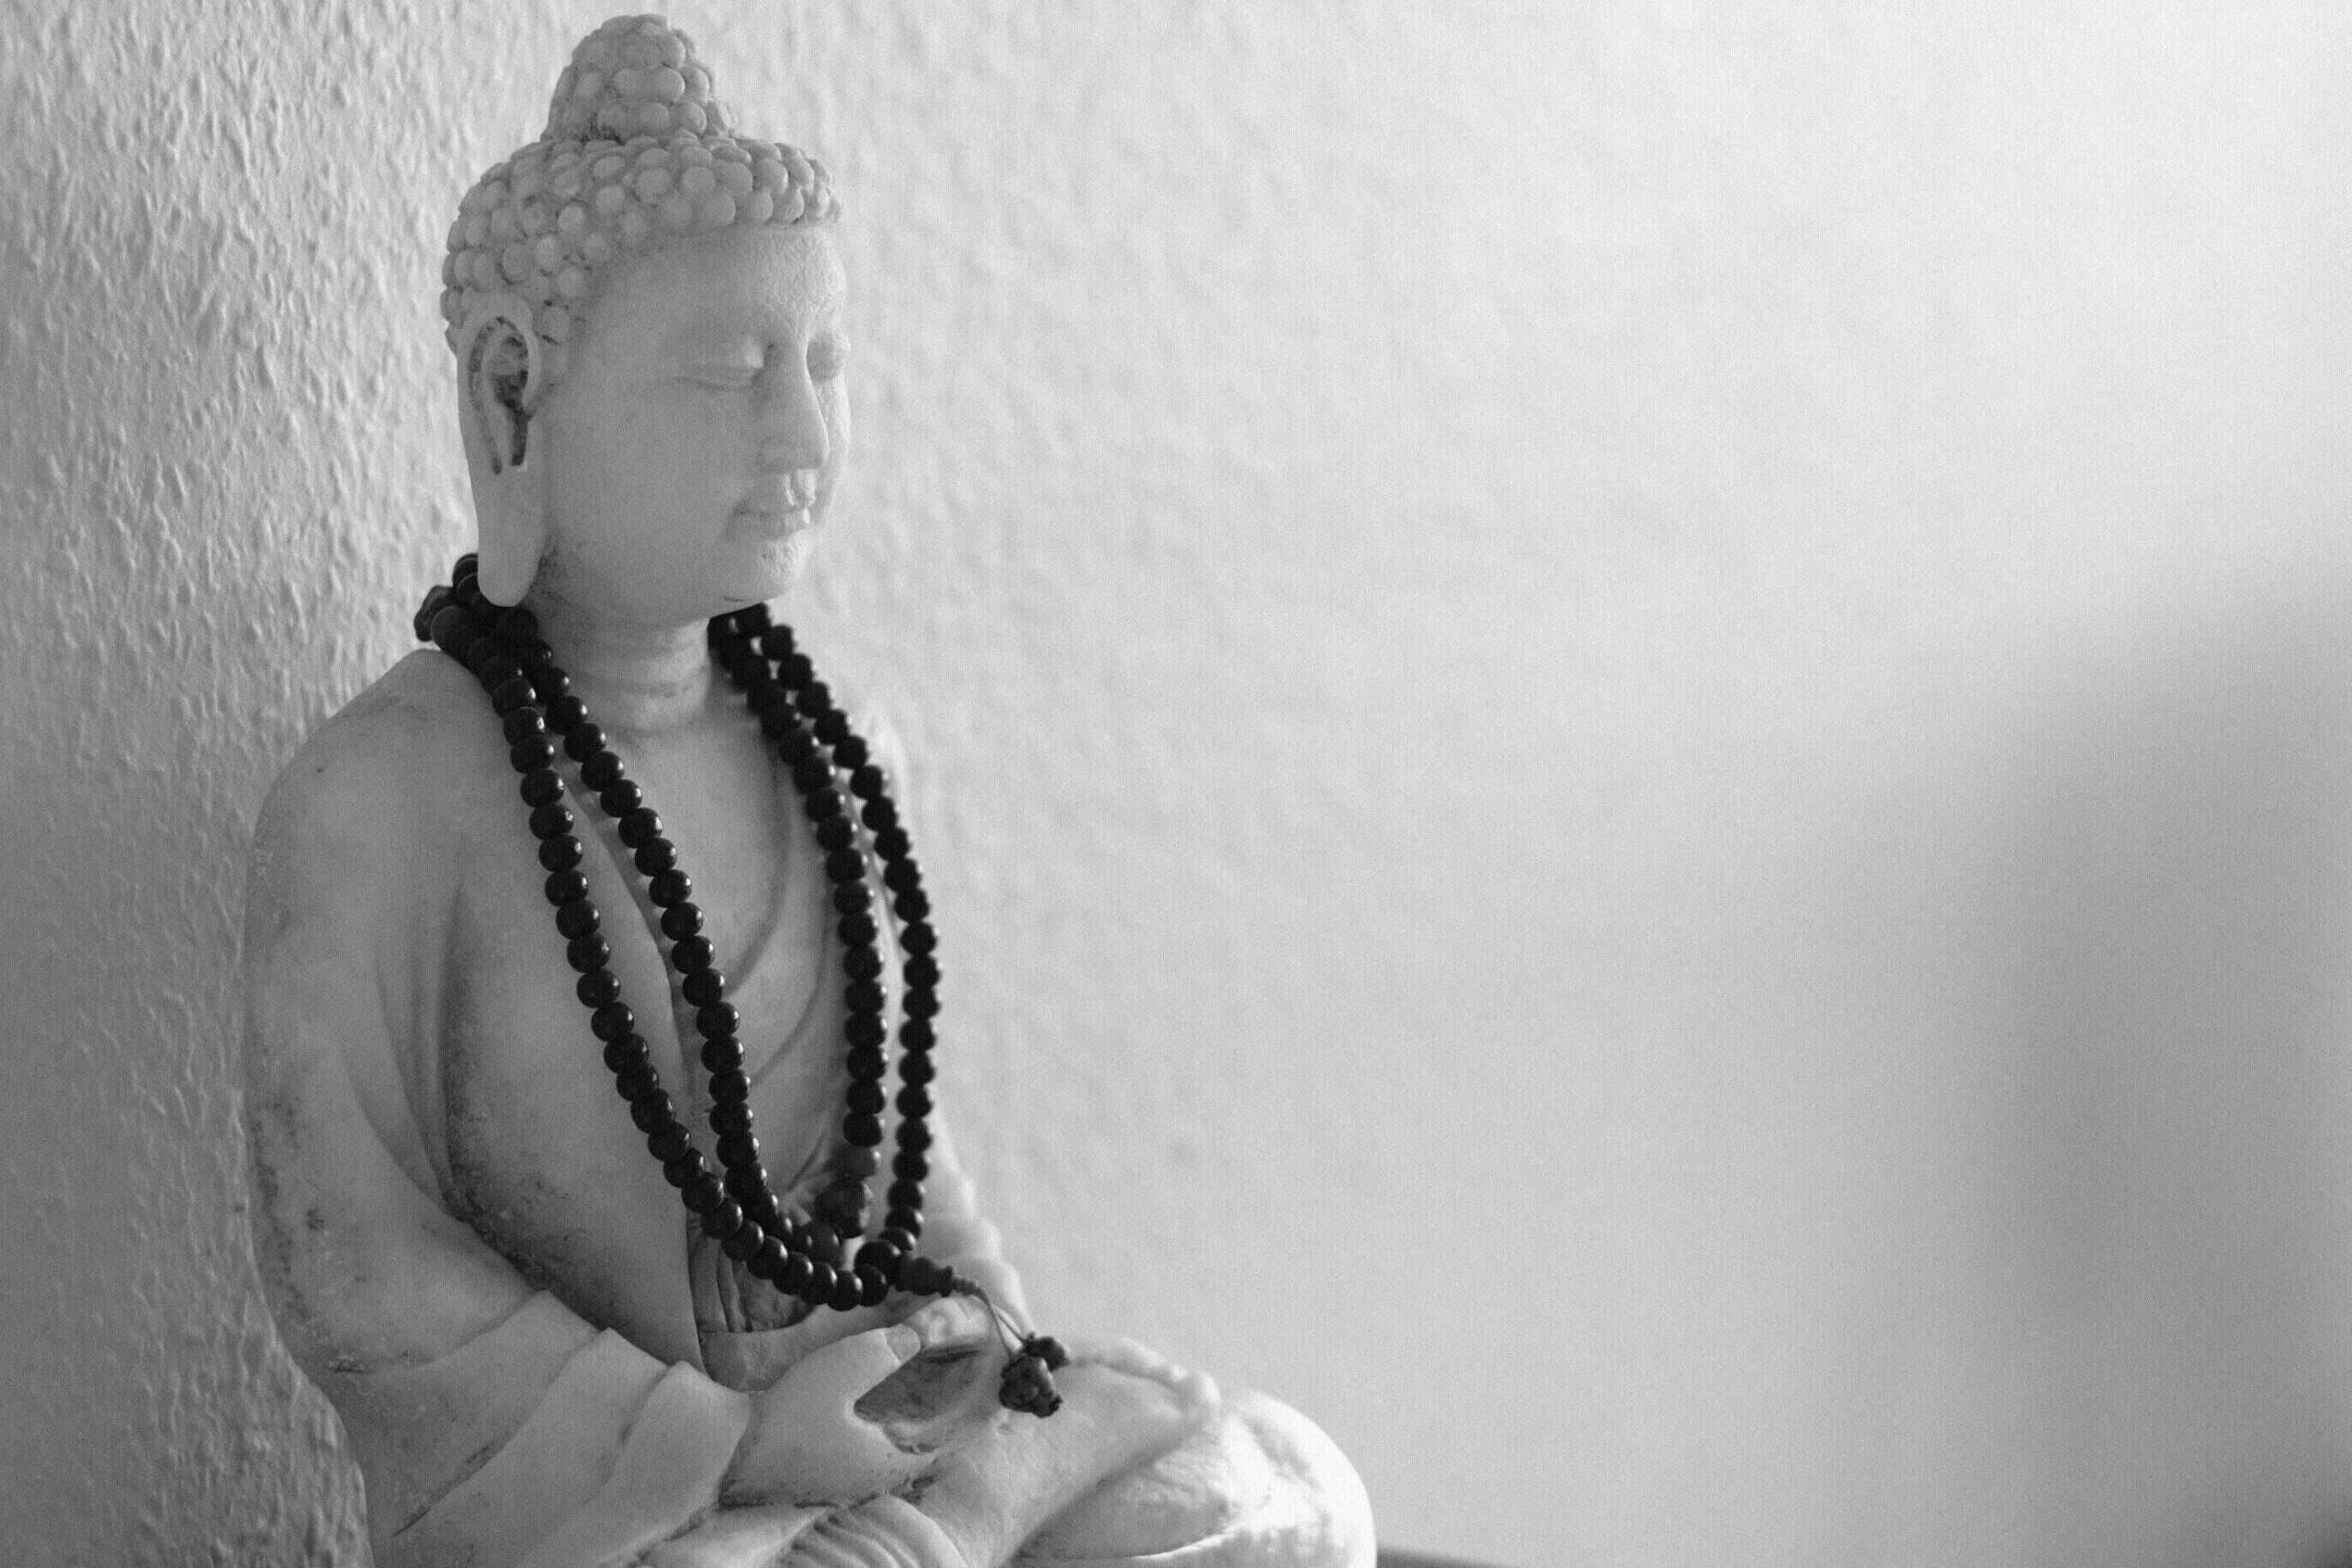 Buddha by Alexander Bock